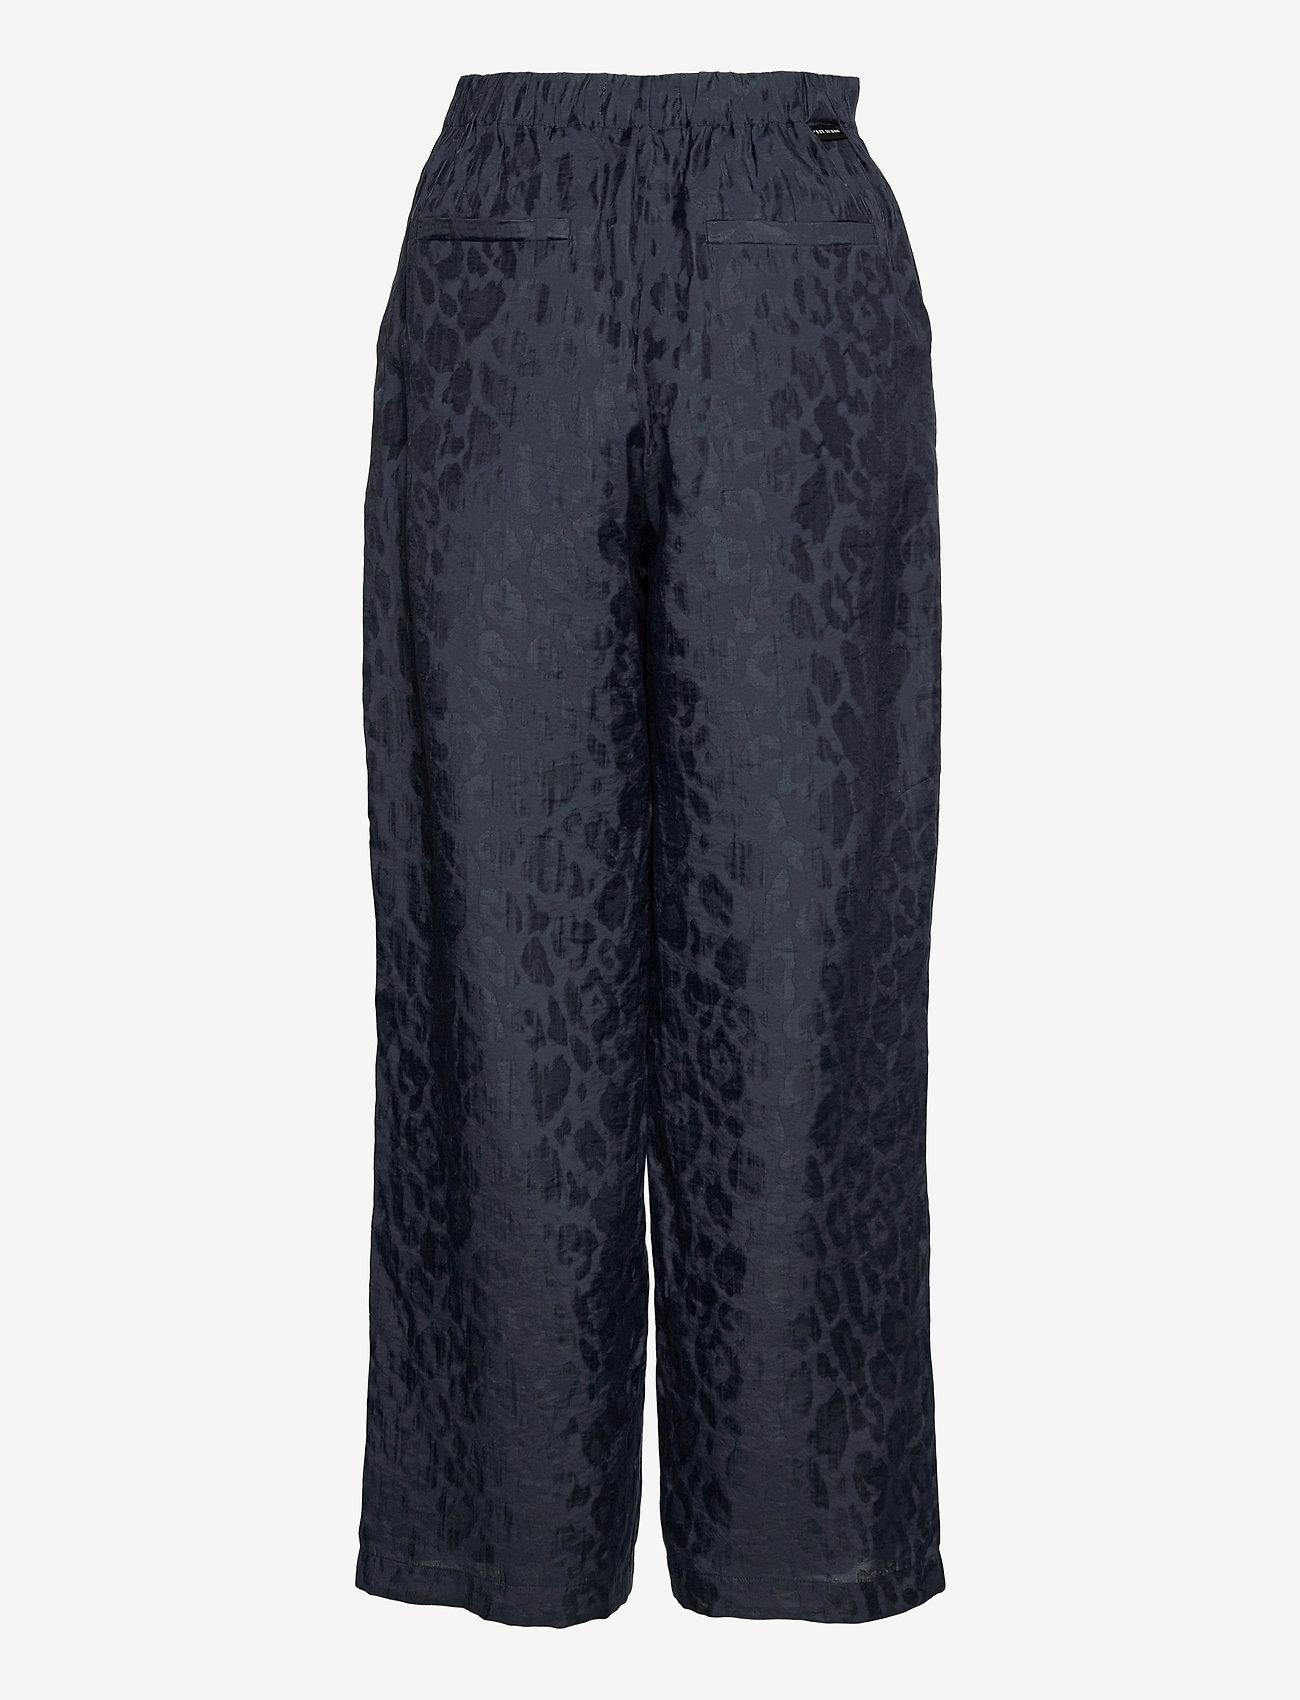 Scotch & Soda - Jogger pants in animal jacquard quality - bukser med brede ben - night - 1